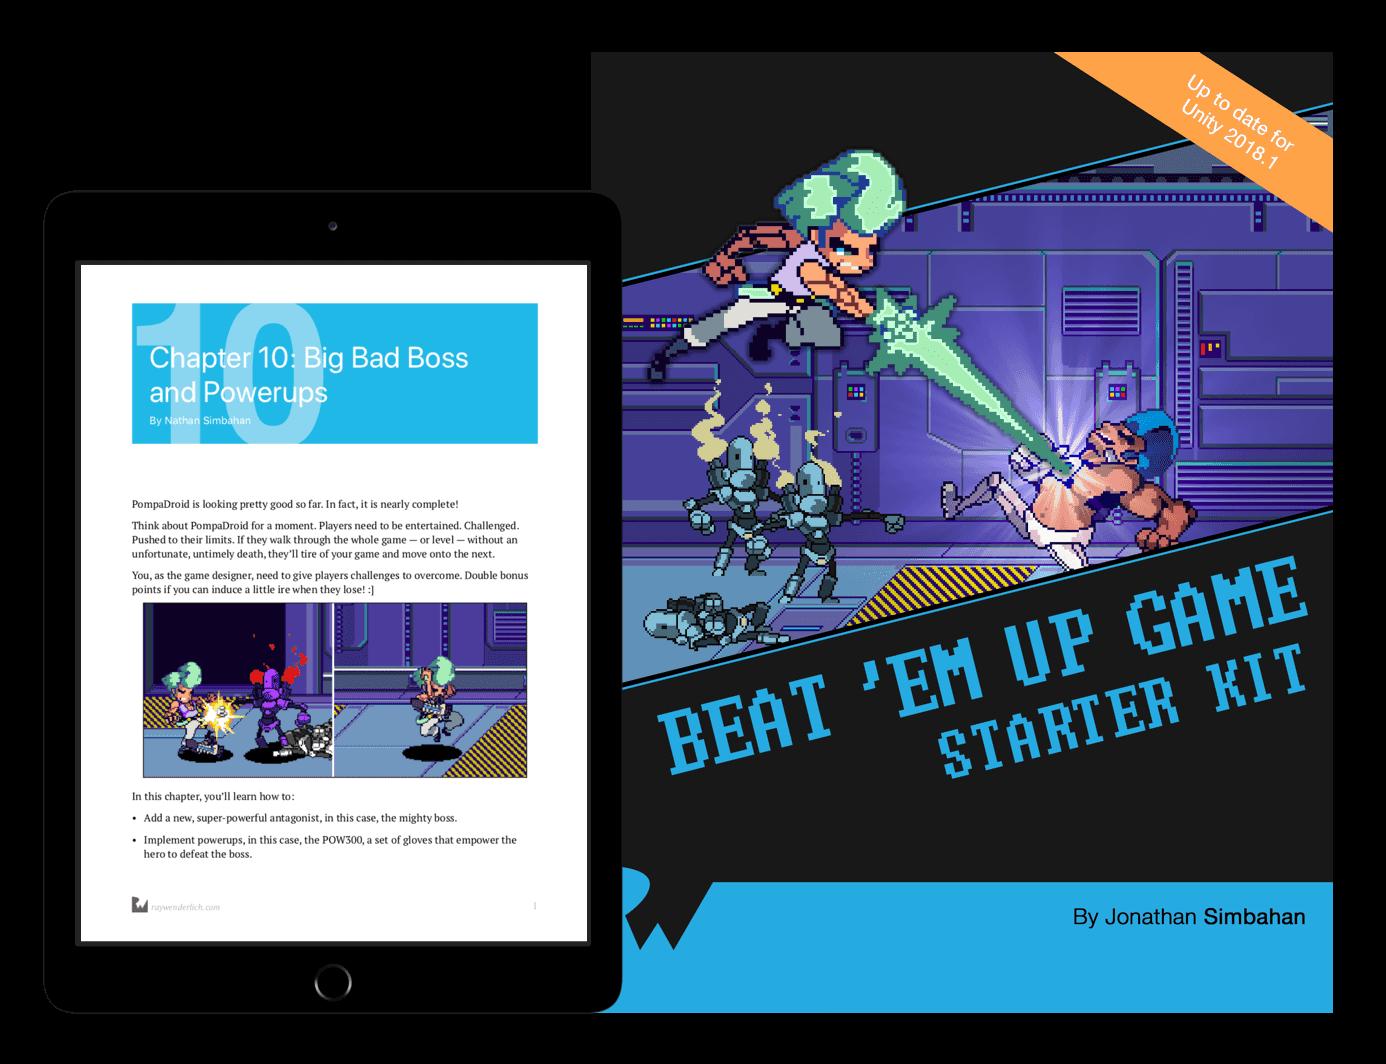 Beat 'Em Up Game Starter Kit book cover